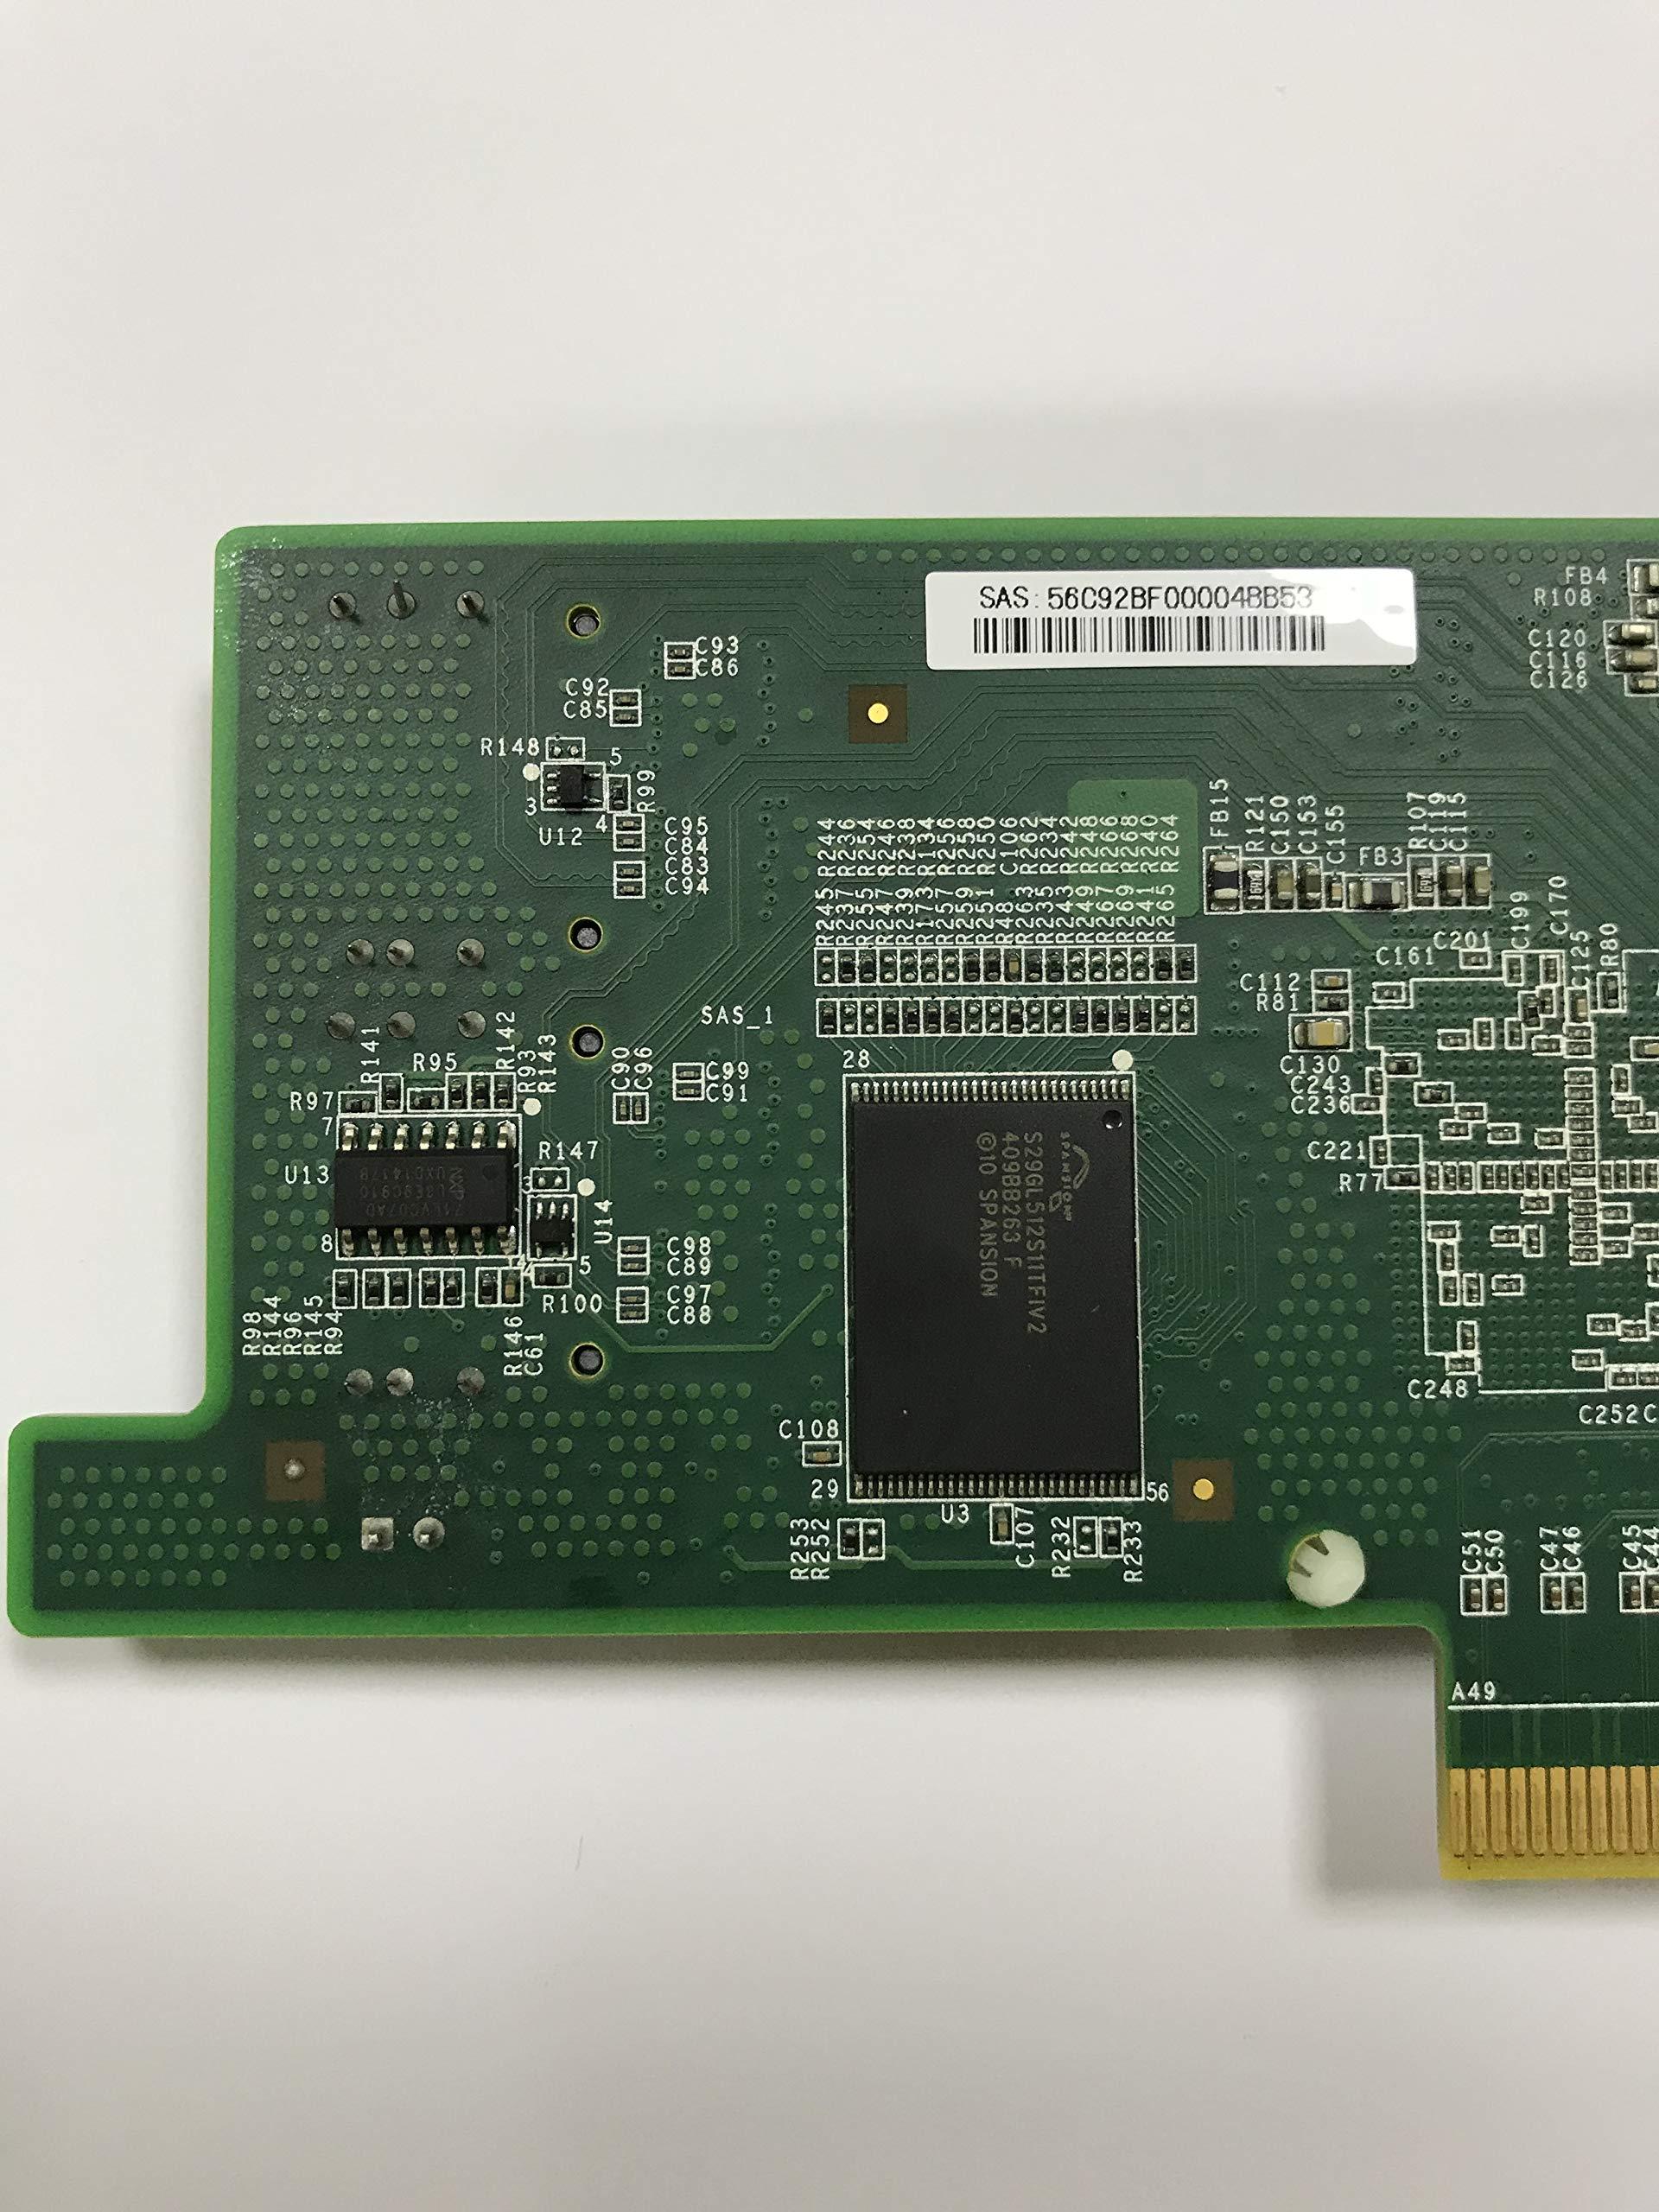 MFU SAS 9207-8i 8-Port 6Gb/s SAS+SATA to PCI Express 2.0 Host Bus Adapter by MFU (Image #4)